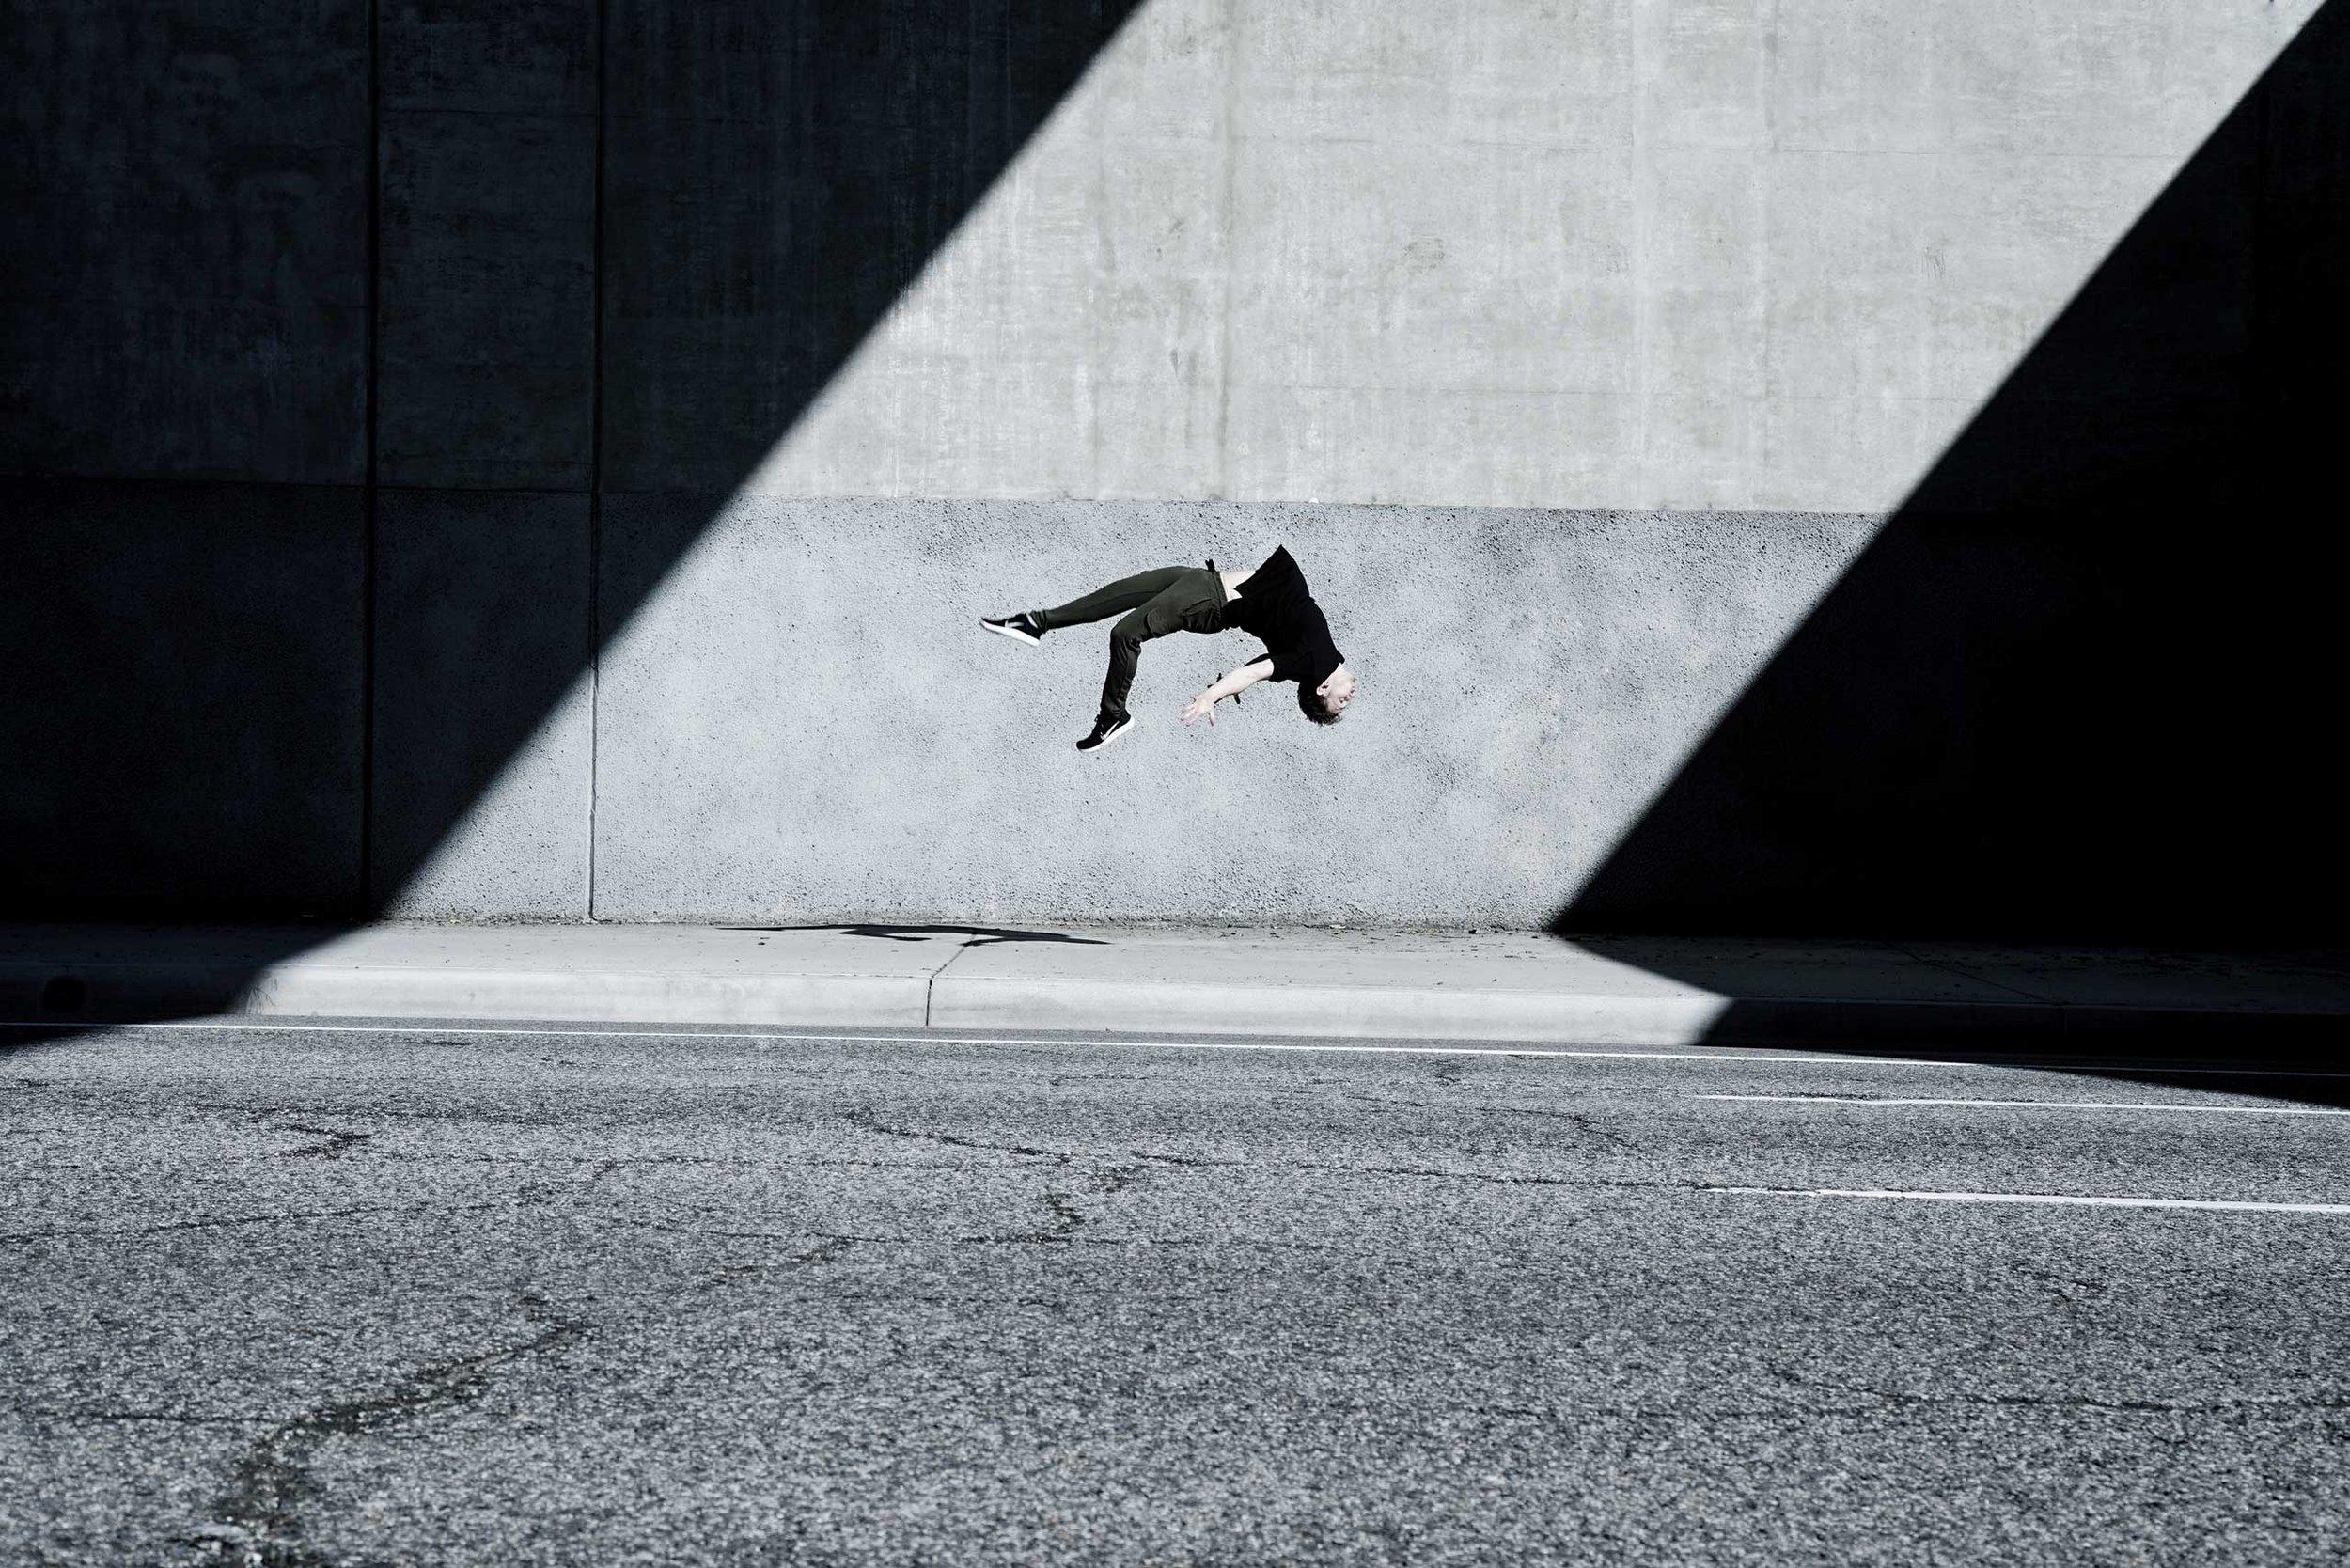 p2_cameras_and_dancers_jacob_jonas_the_company_yatzer.jpg